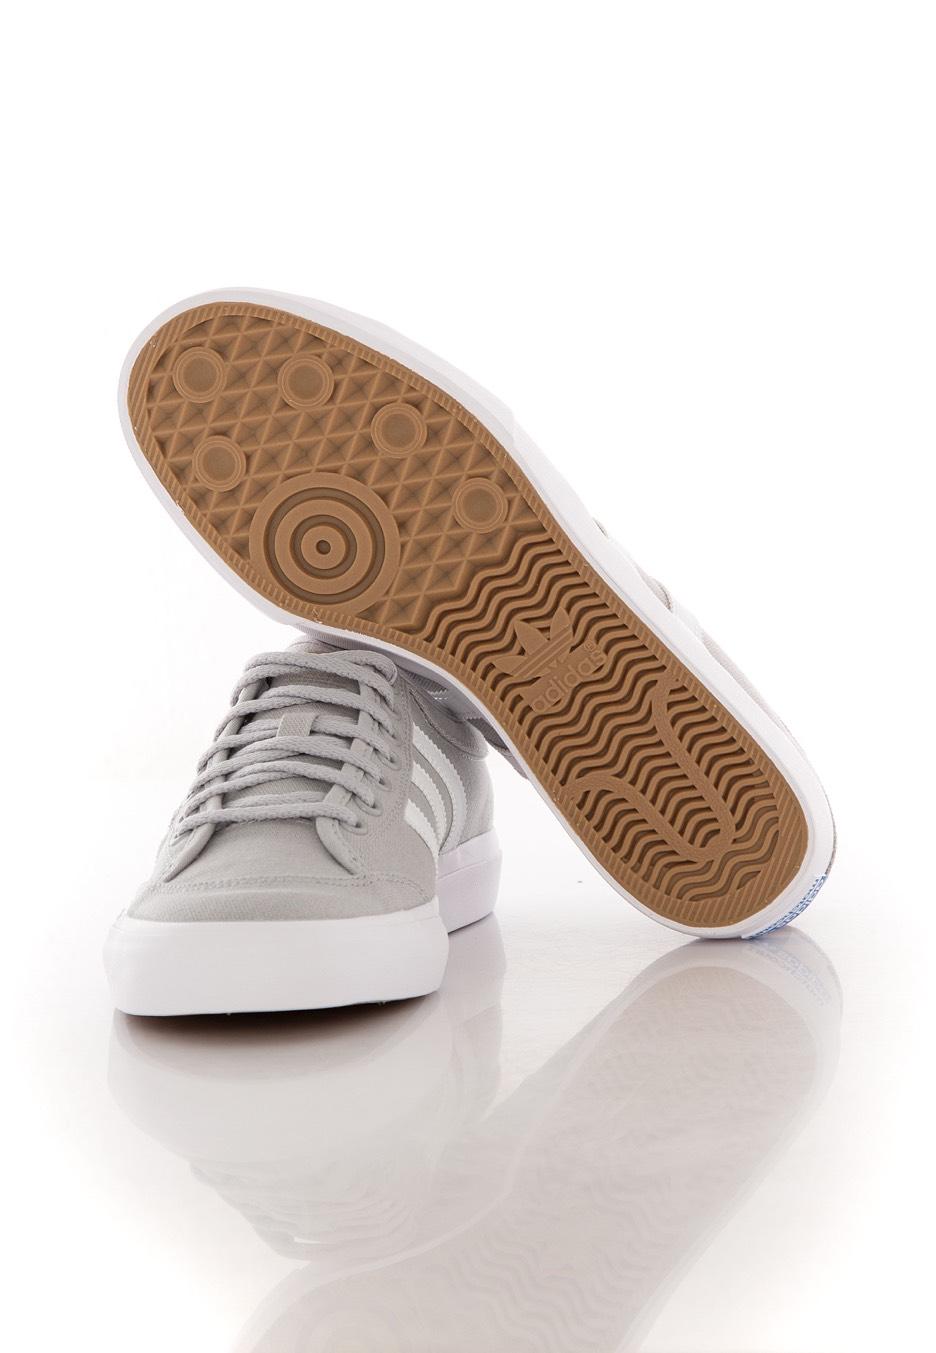 ... Adidas - Matchcourt Grey TwoFtwr WhiteGum 4 - Shoes ...